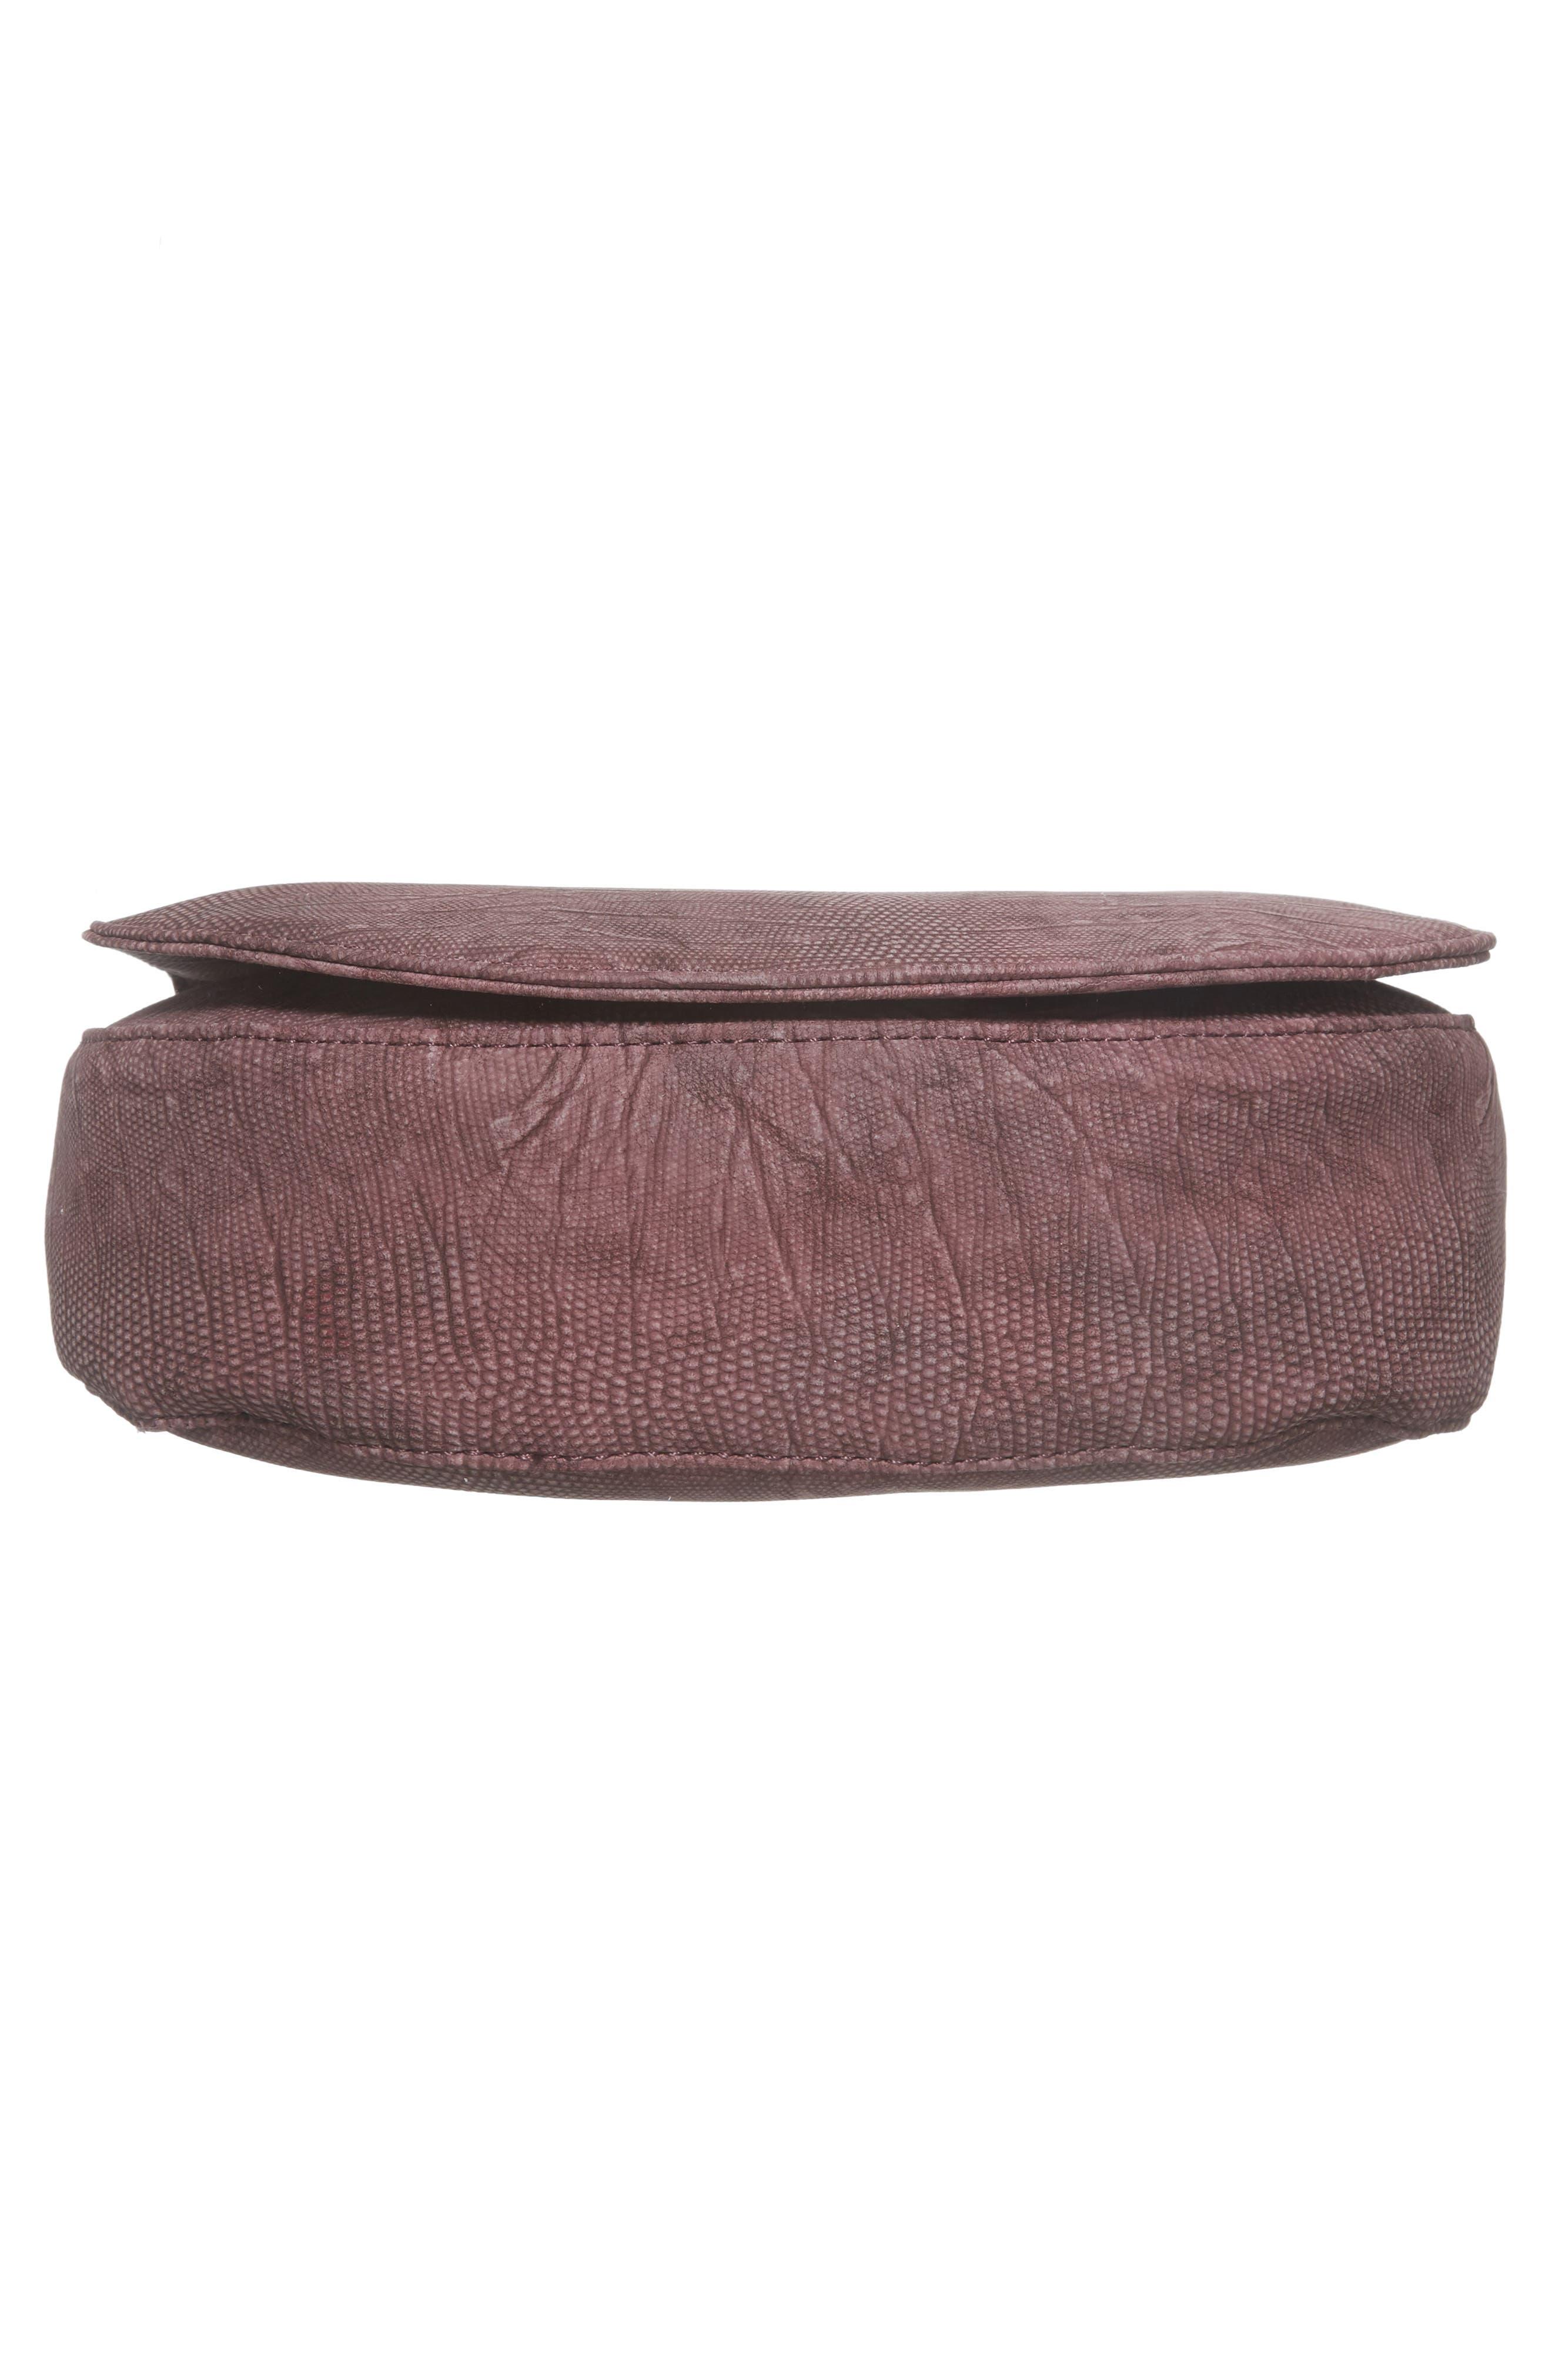 Livvy Faux Leather Crossbody Saddle Bag,                             Alternate thumbnail 6, color,                             Oxblood